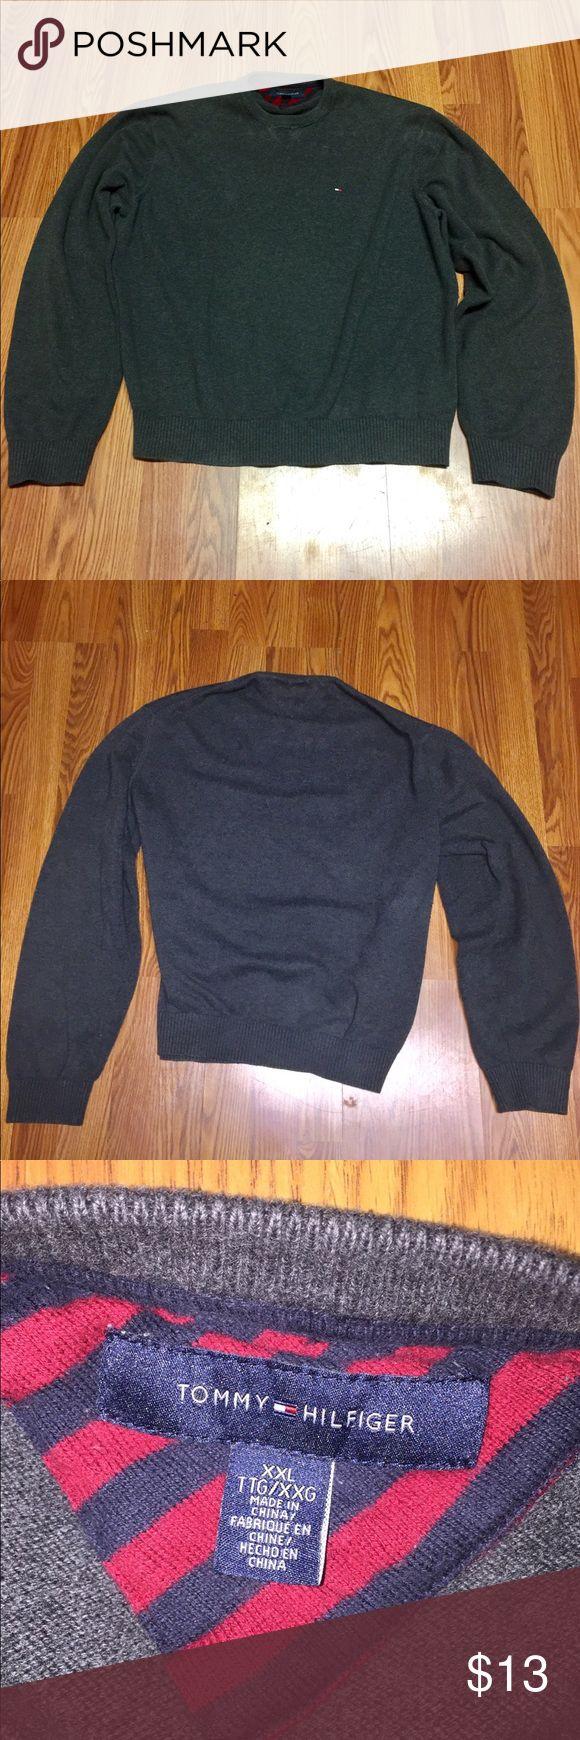 Tommy Hilfiger sweater Tommy Hilfiger dark grey sweatshirt pre washed very soft XXL fits true to size Tommy Hilfiger Sweaters Crewneck